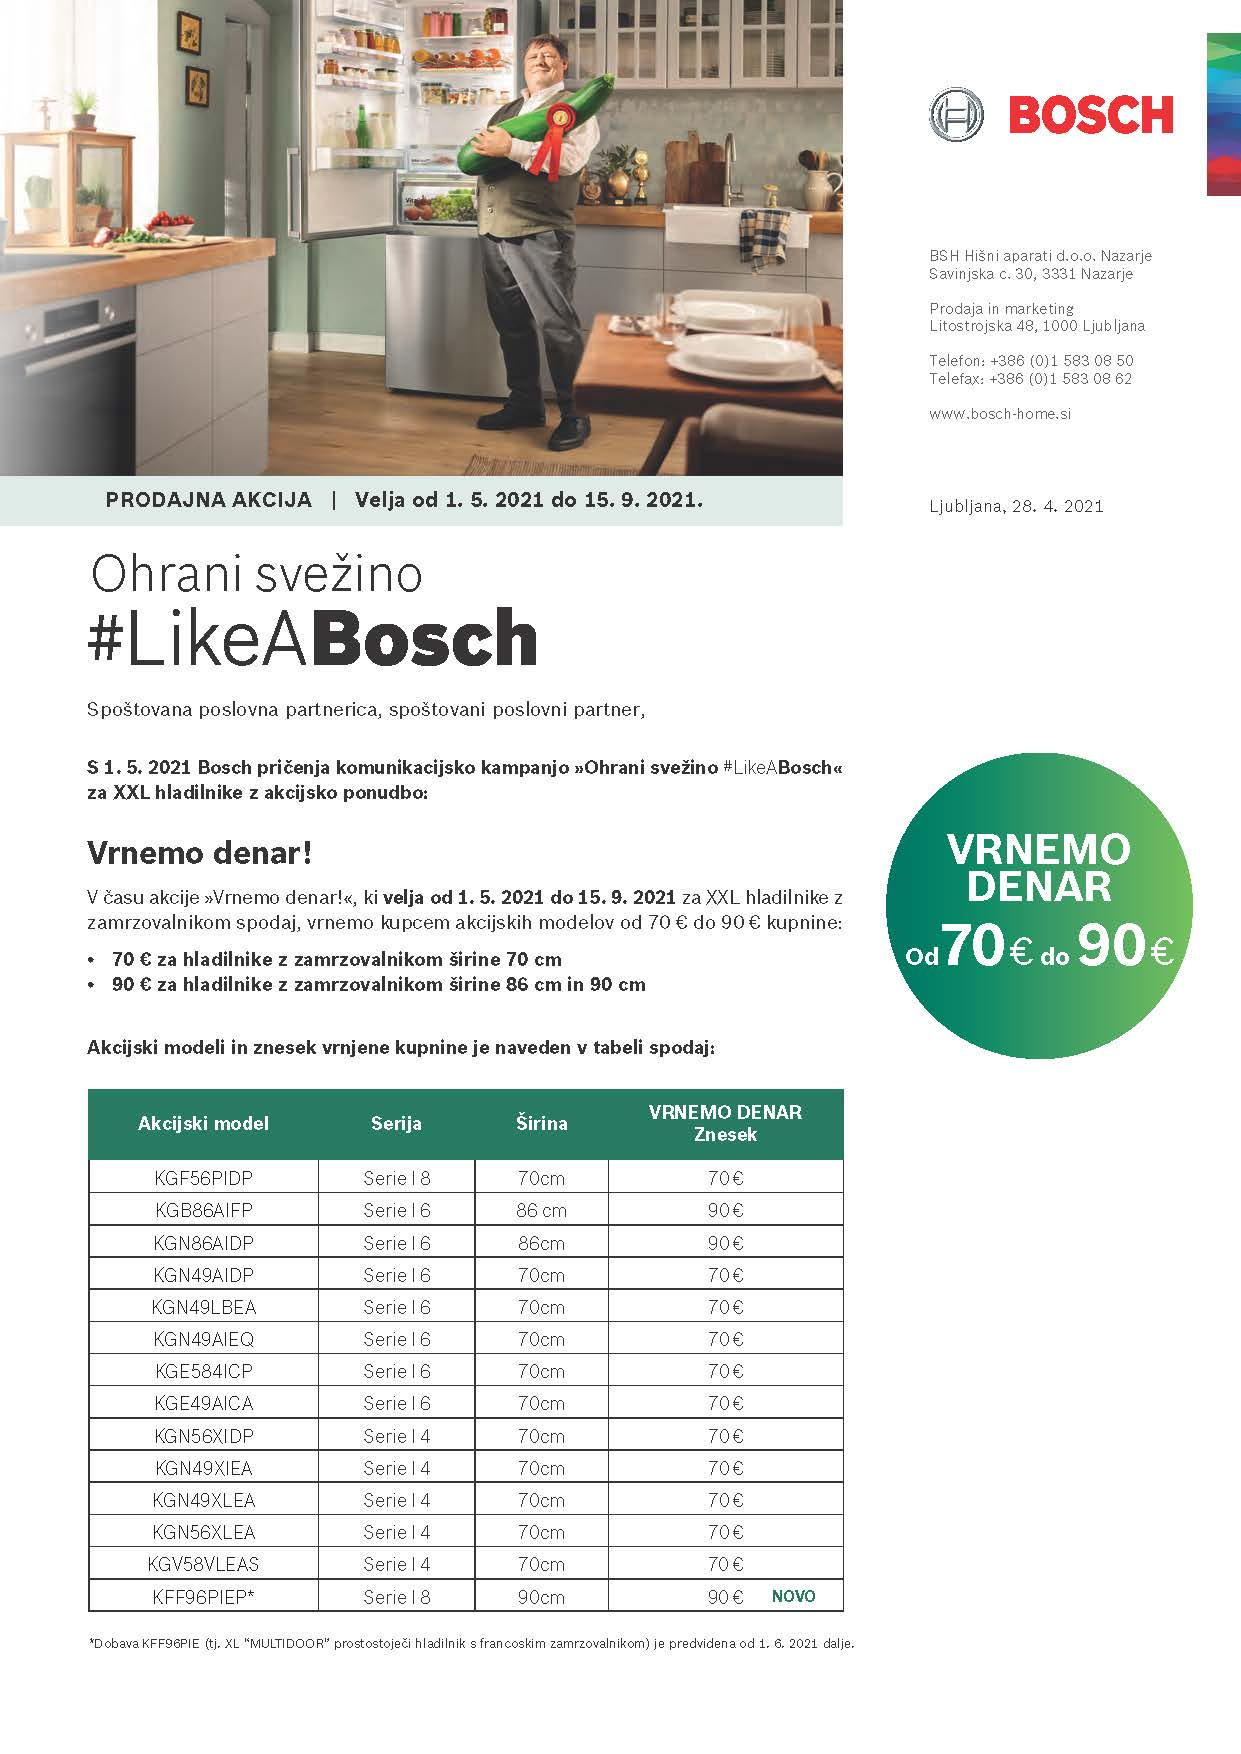 Vrnemo denar!_XXL hladilnik Bosch_1.5.-15.9.2021_Page_1